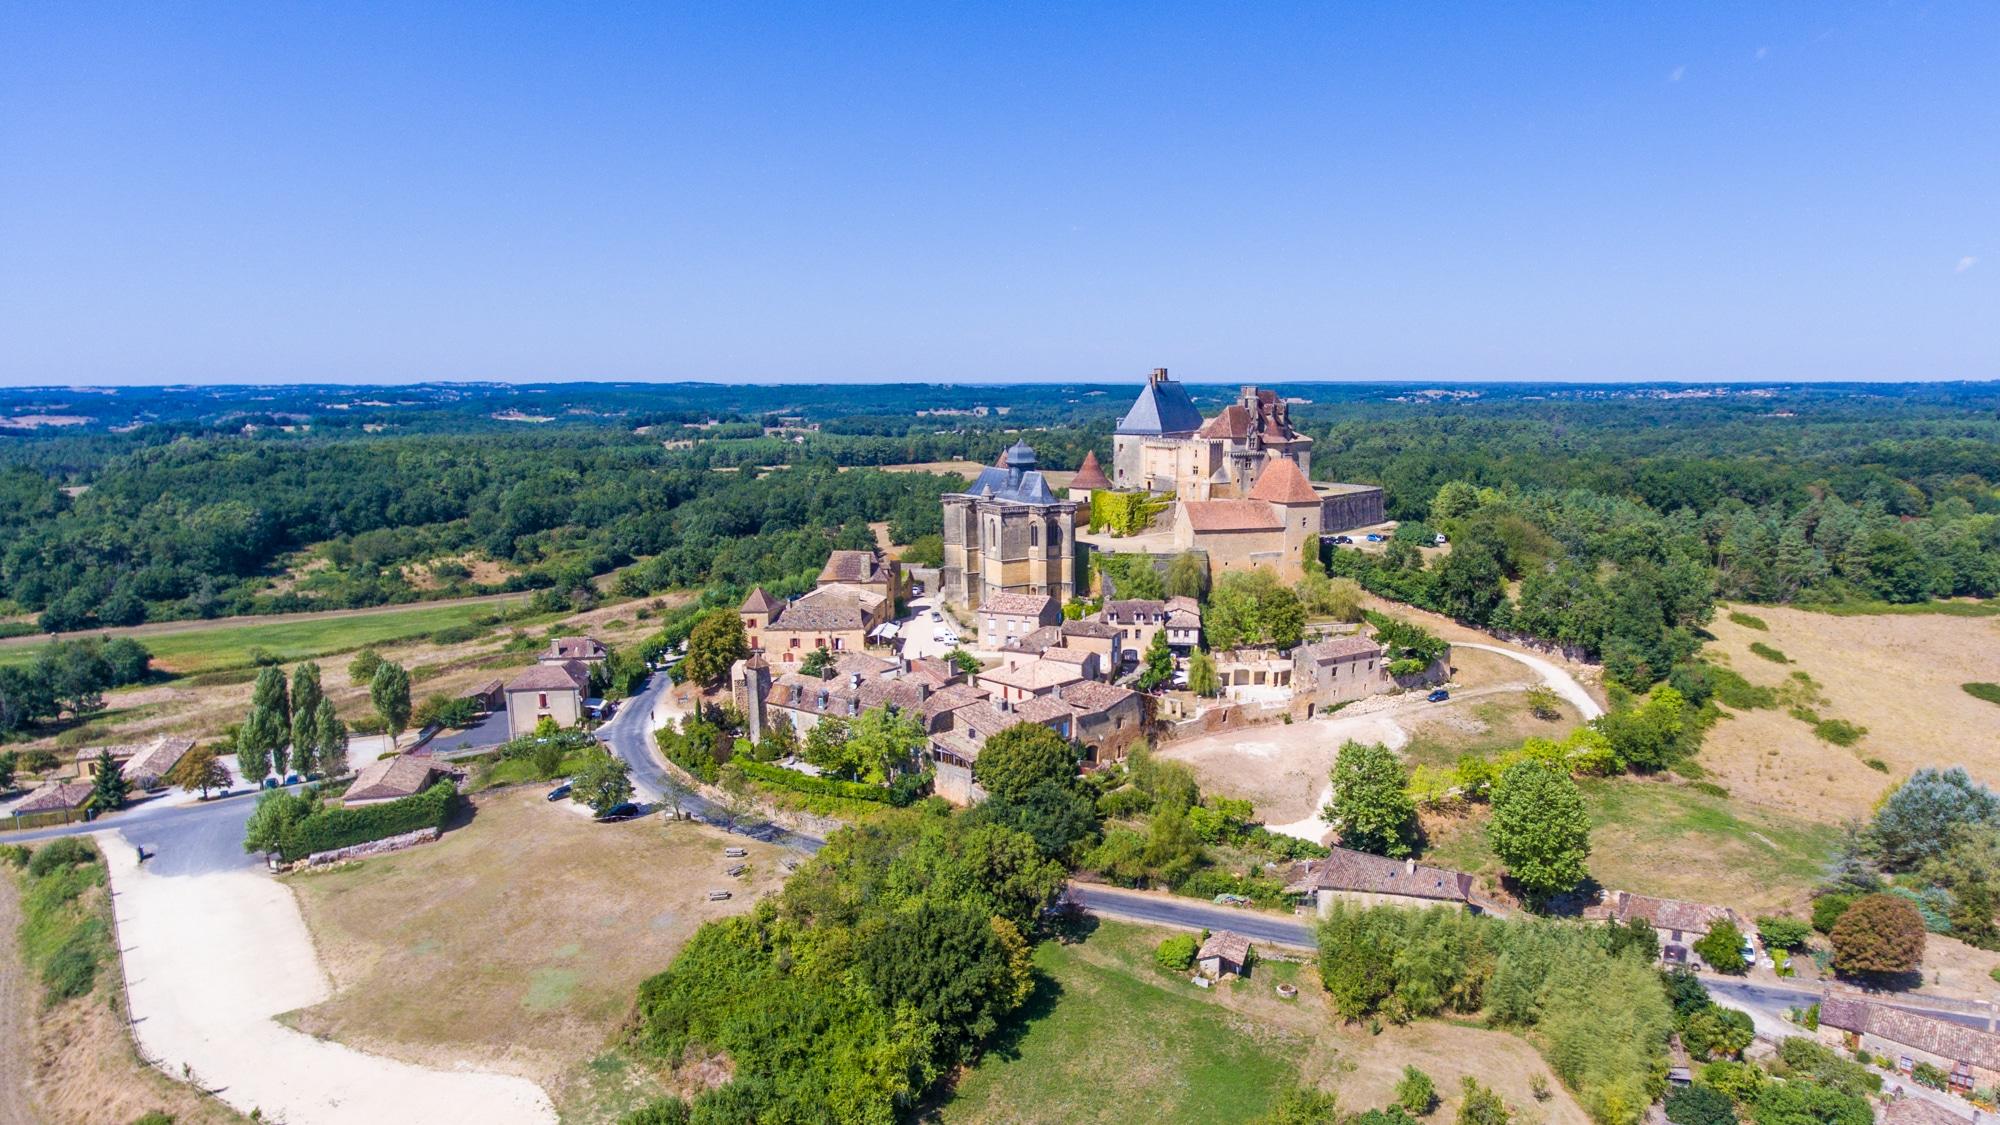 chateau de biron drone